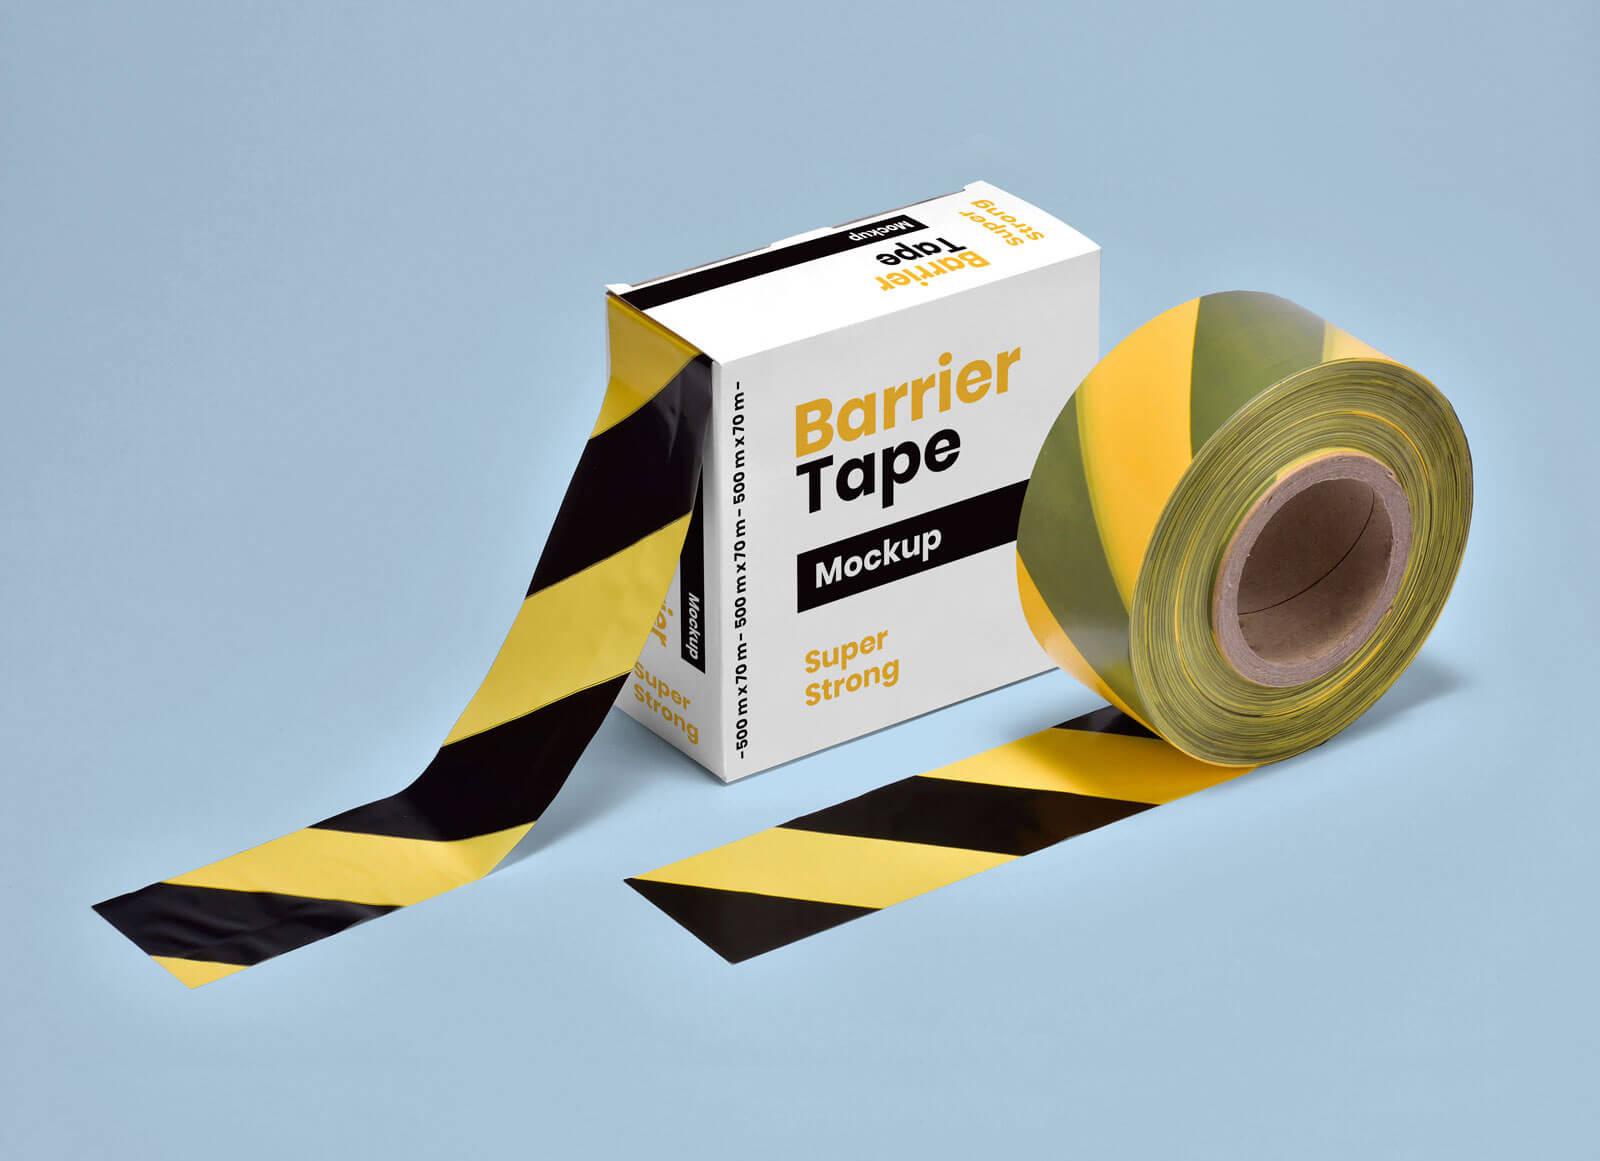 Free Barrier / Cordon Off Barricade Tape Packaging Box Mockup PSD